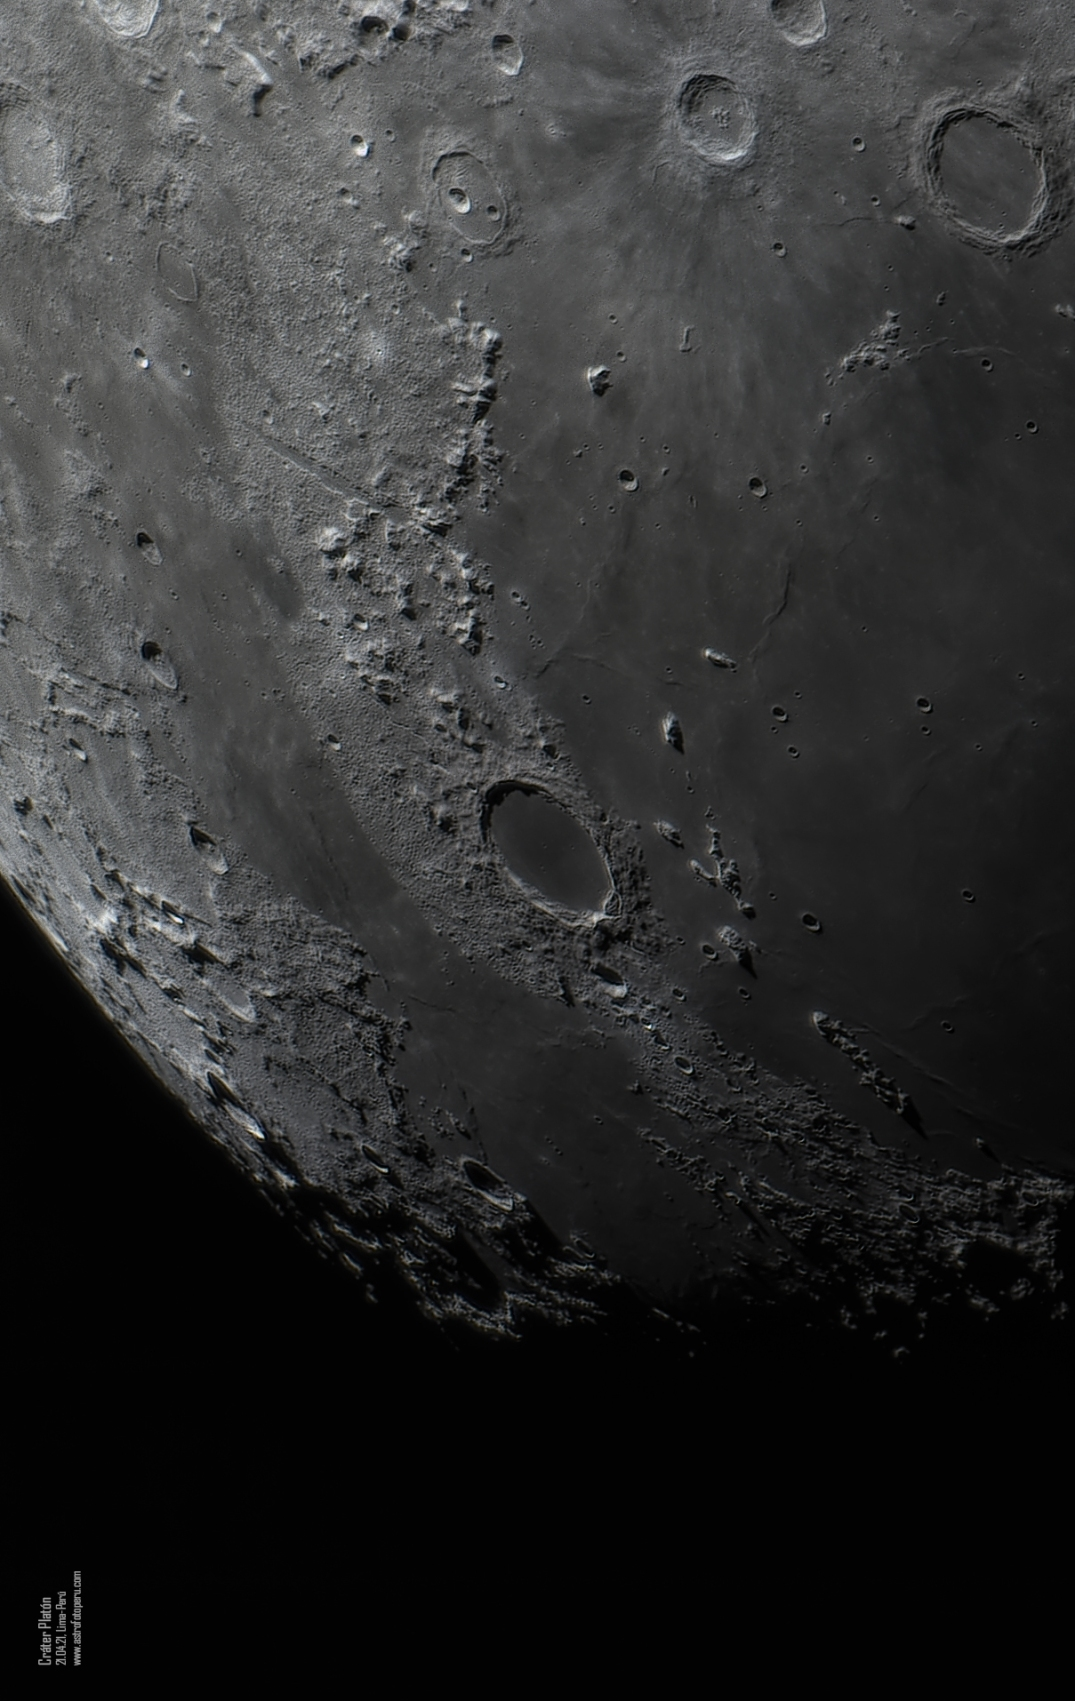 Crater Platon - 21.04.21 - astrofotoperu - 174MC - 5080 mm